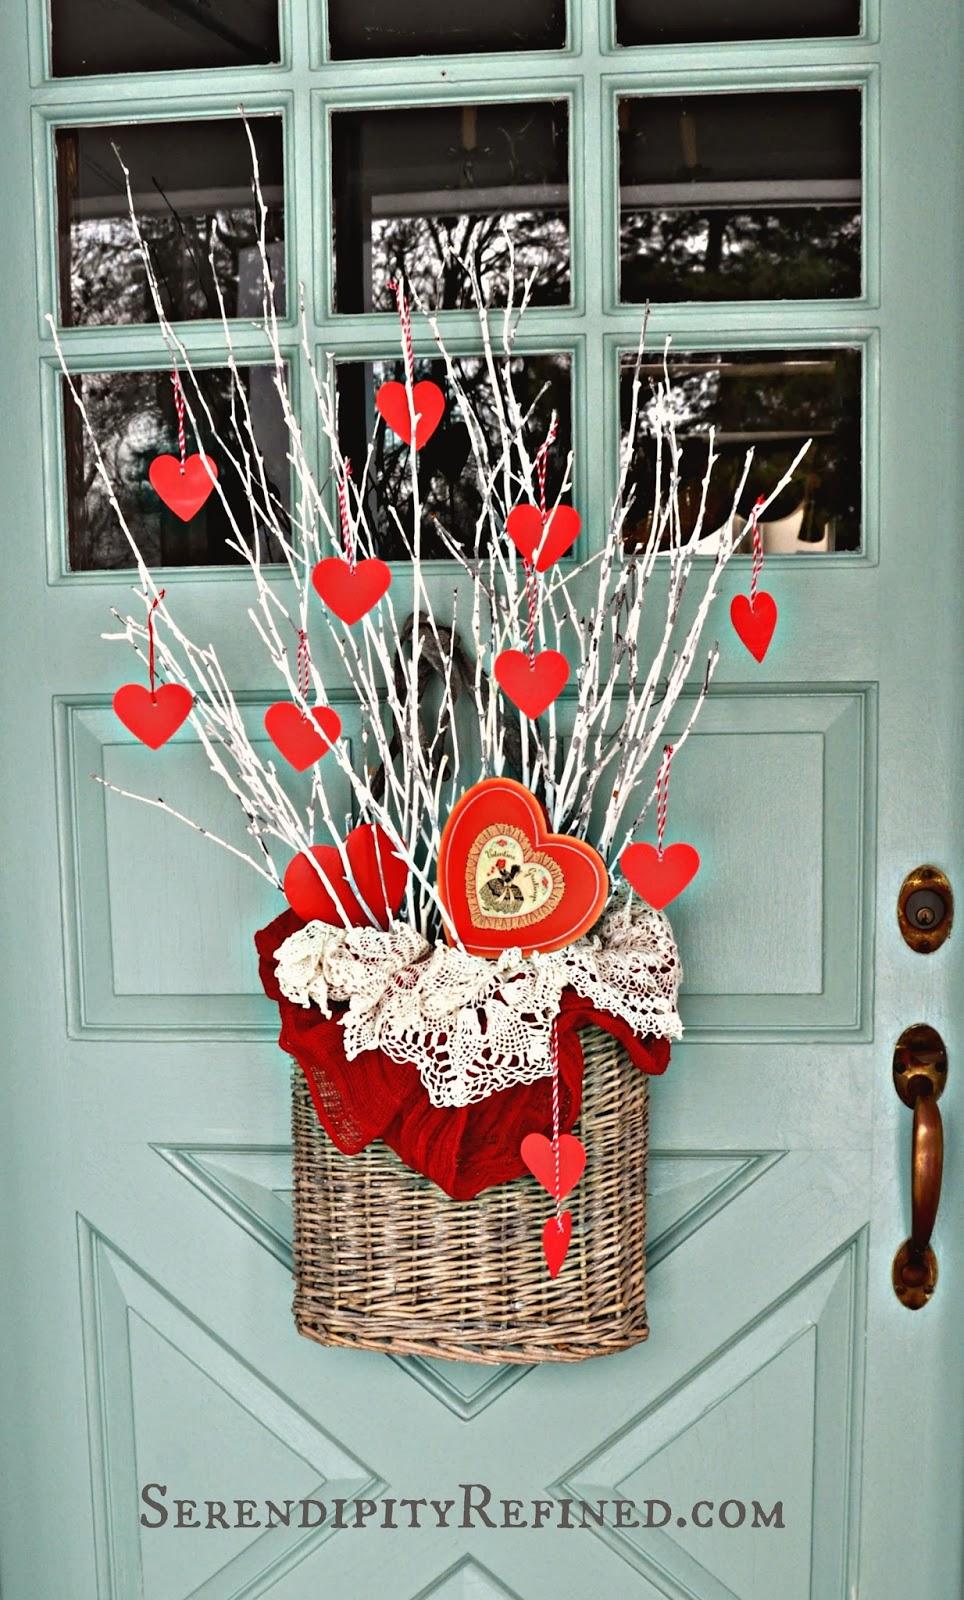 Serendipity Refined Blog: Simple DIY Valentines Day Door Decor